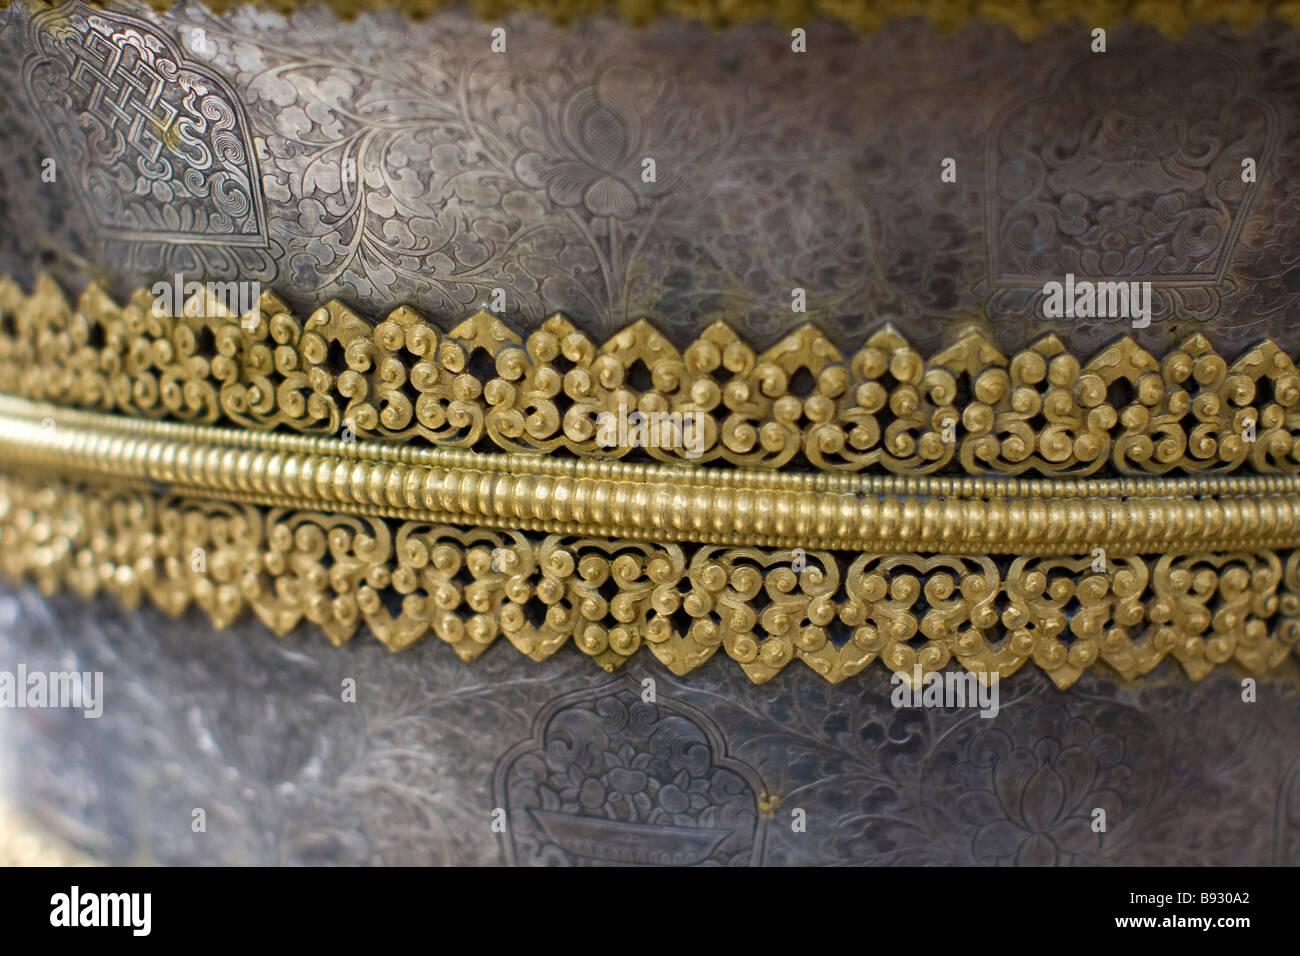 Tibetan metalwork and gold - Stock Image